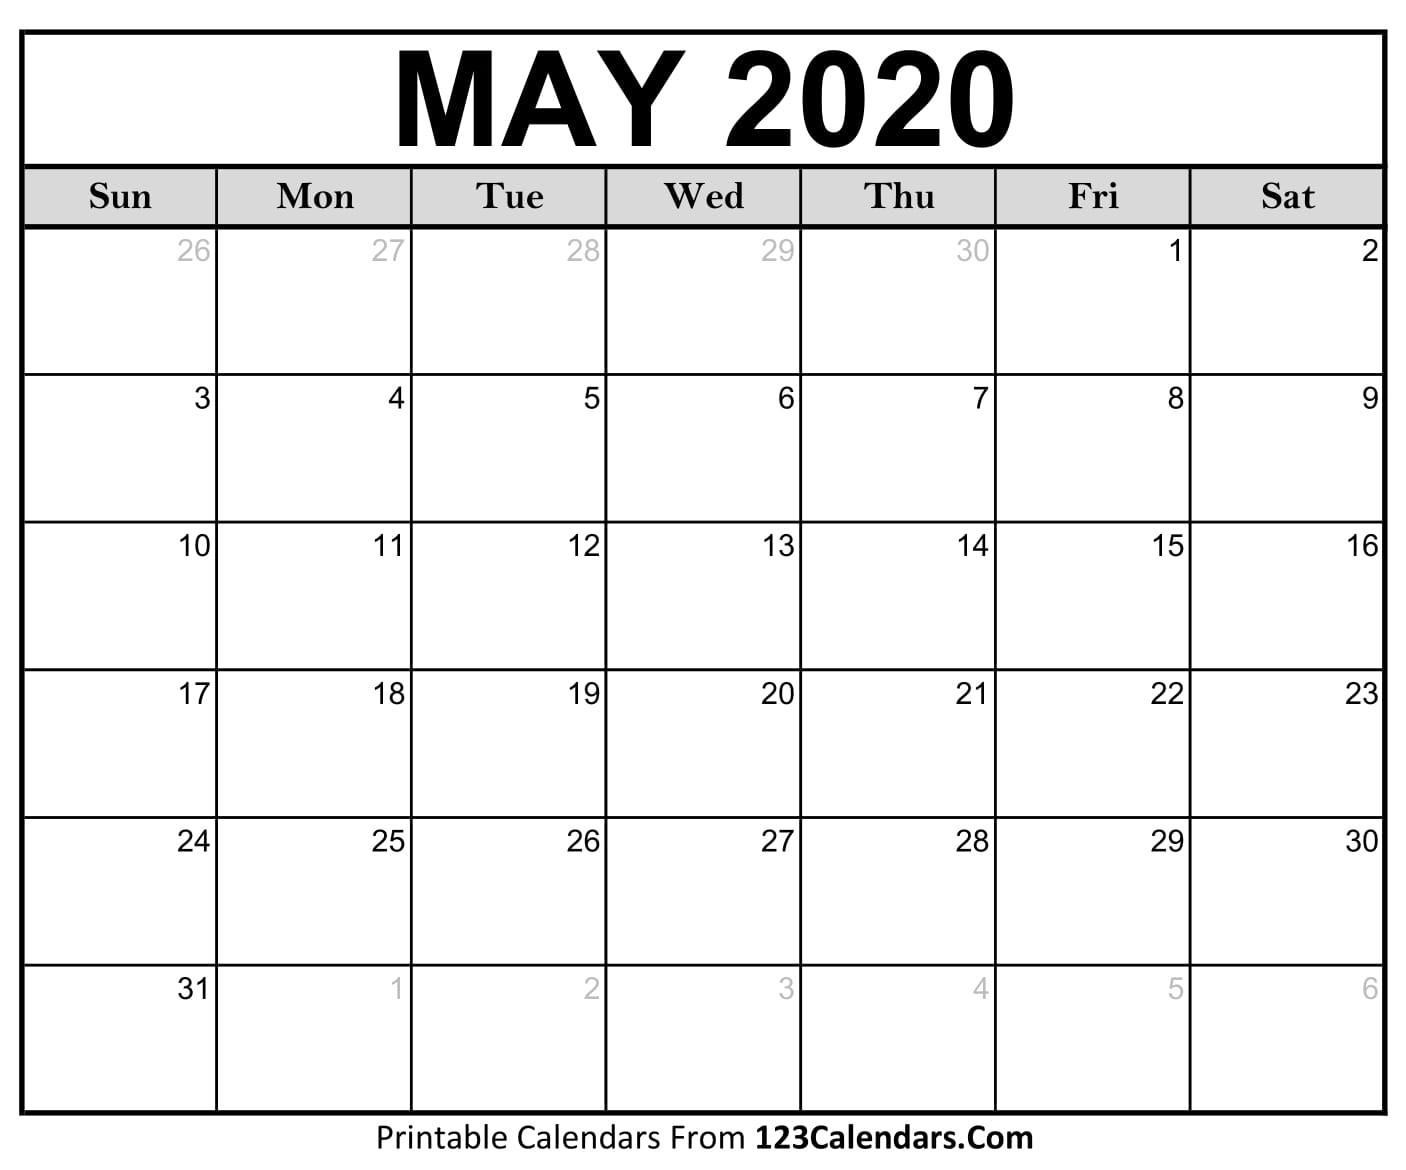 Printable May 2020 Calendar Templates | 123Calendars  May 2020 Calendar Printable